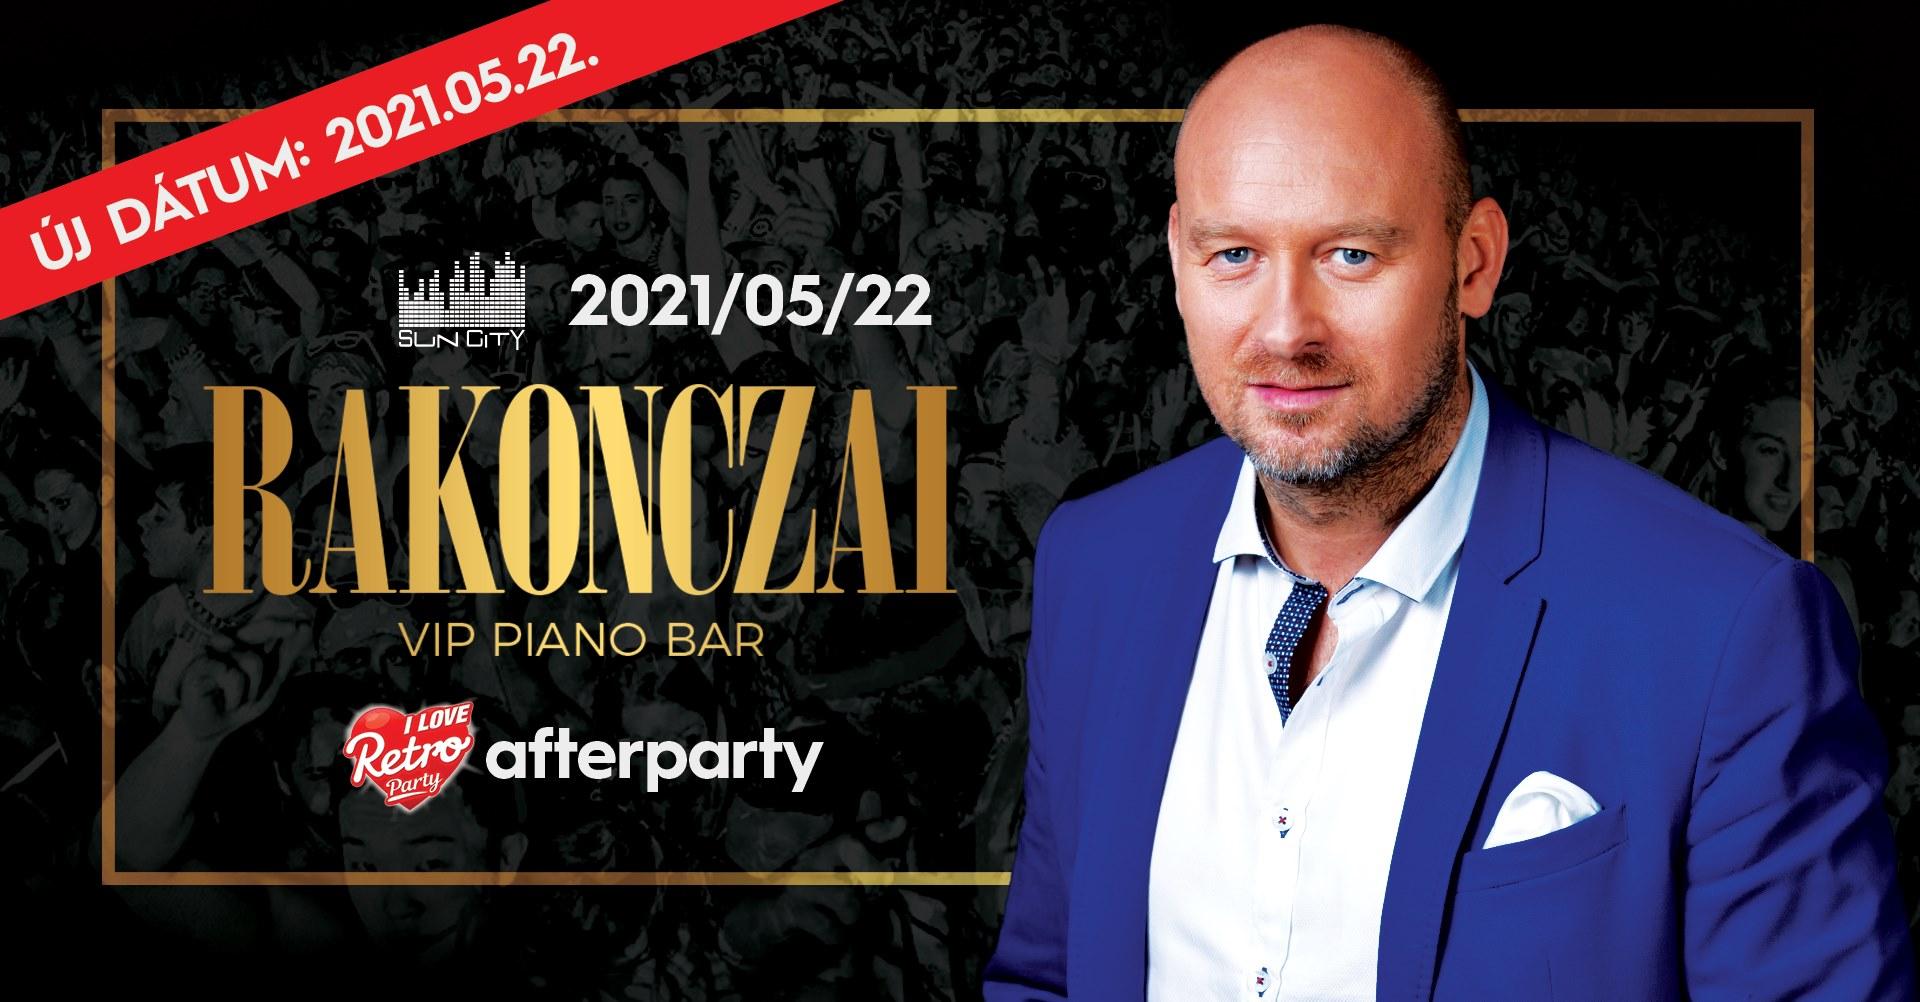 Rakonczai VIP Piano Bar • 2021 05 22 • SunCity Balatonfüred